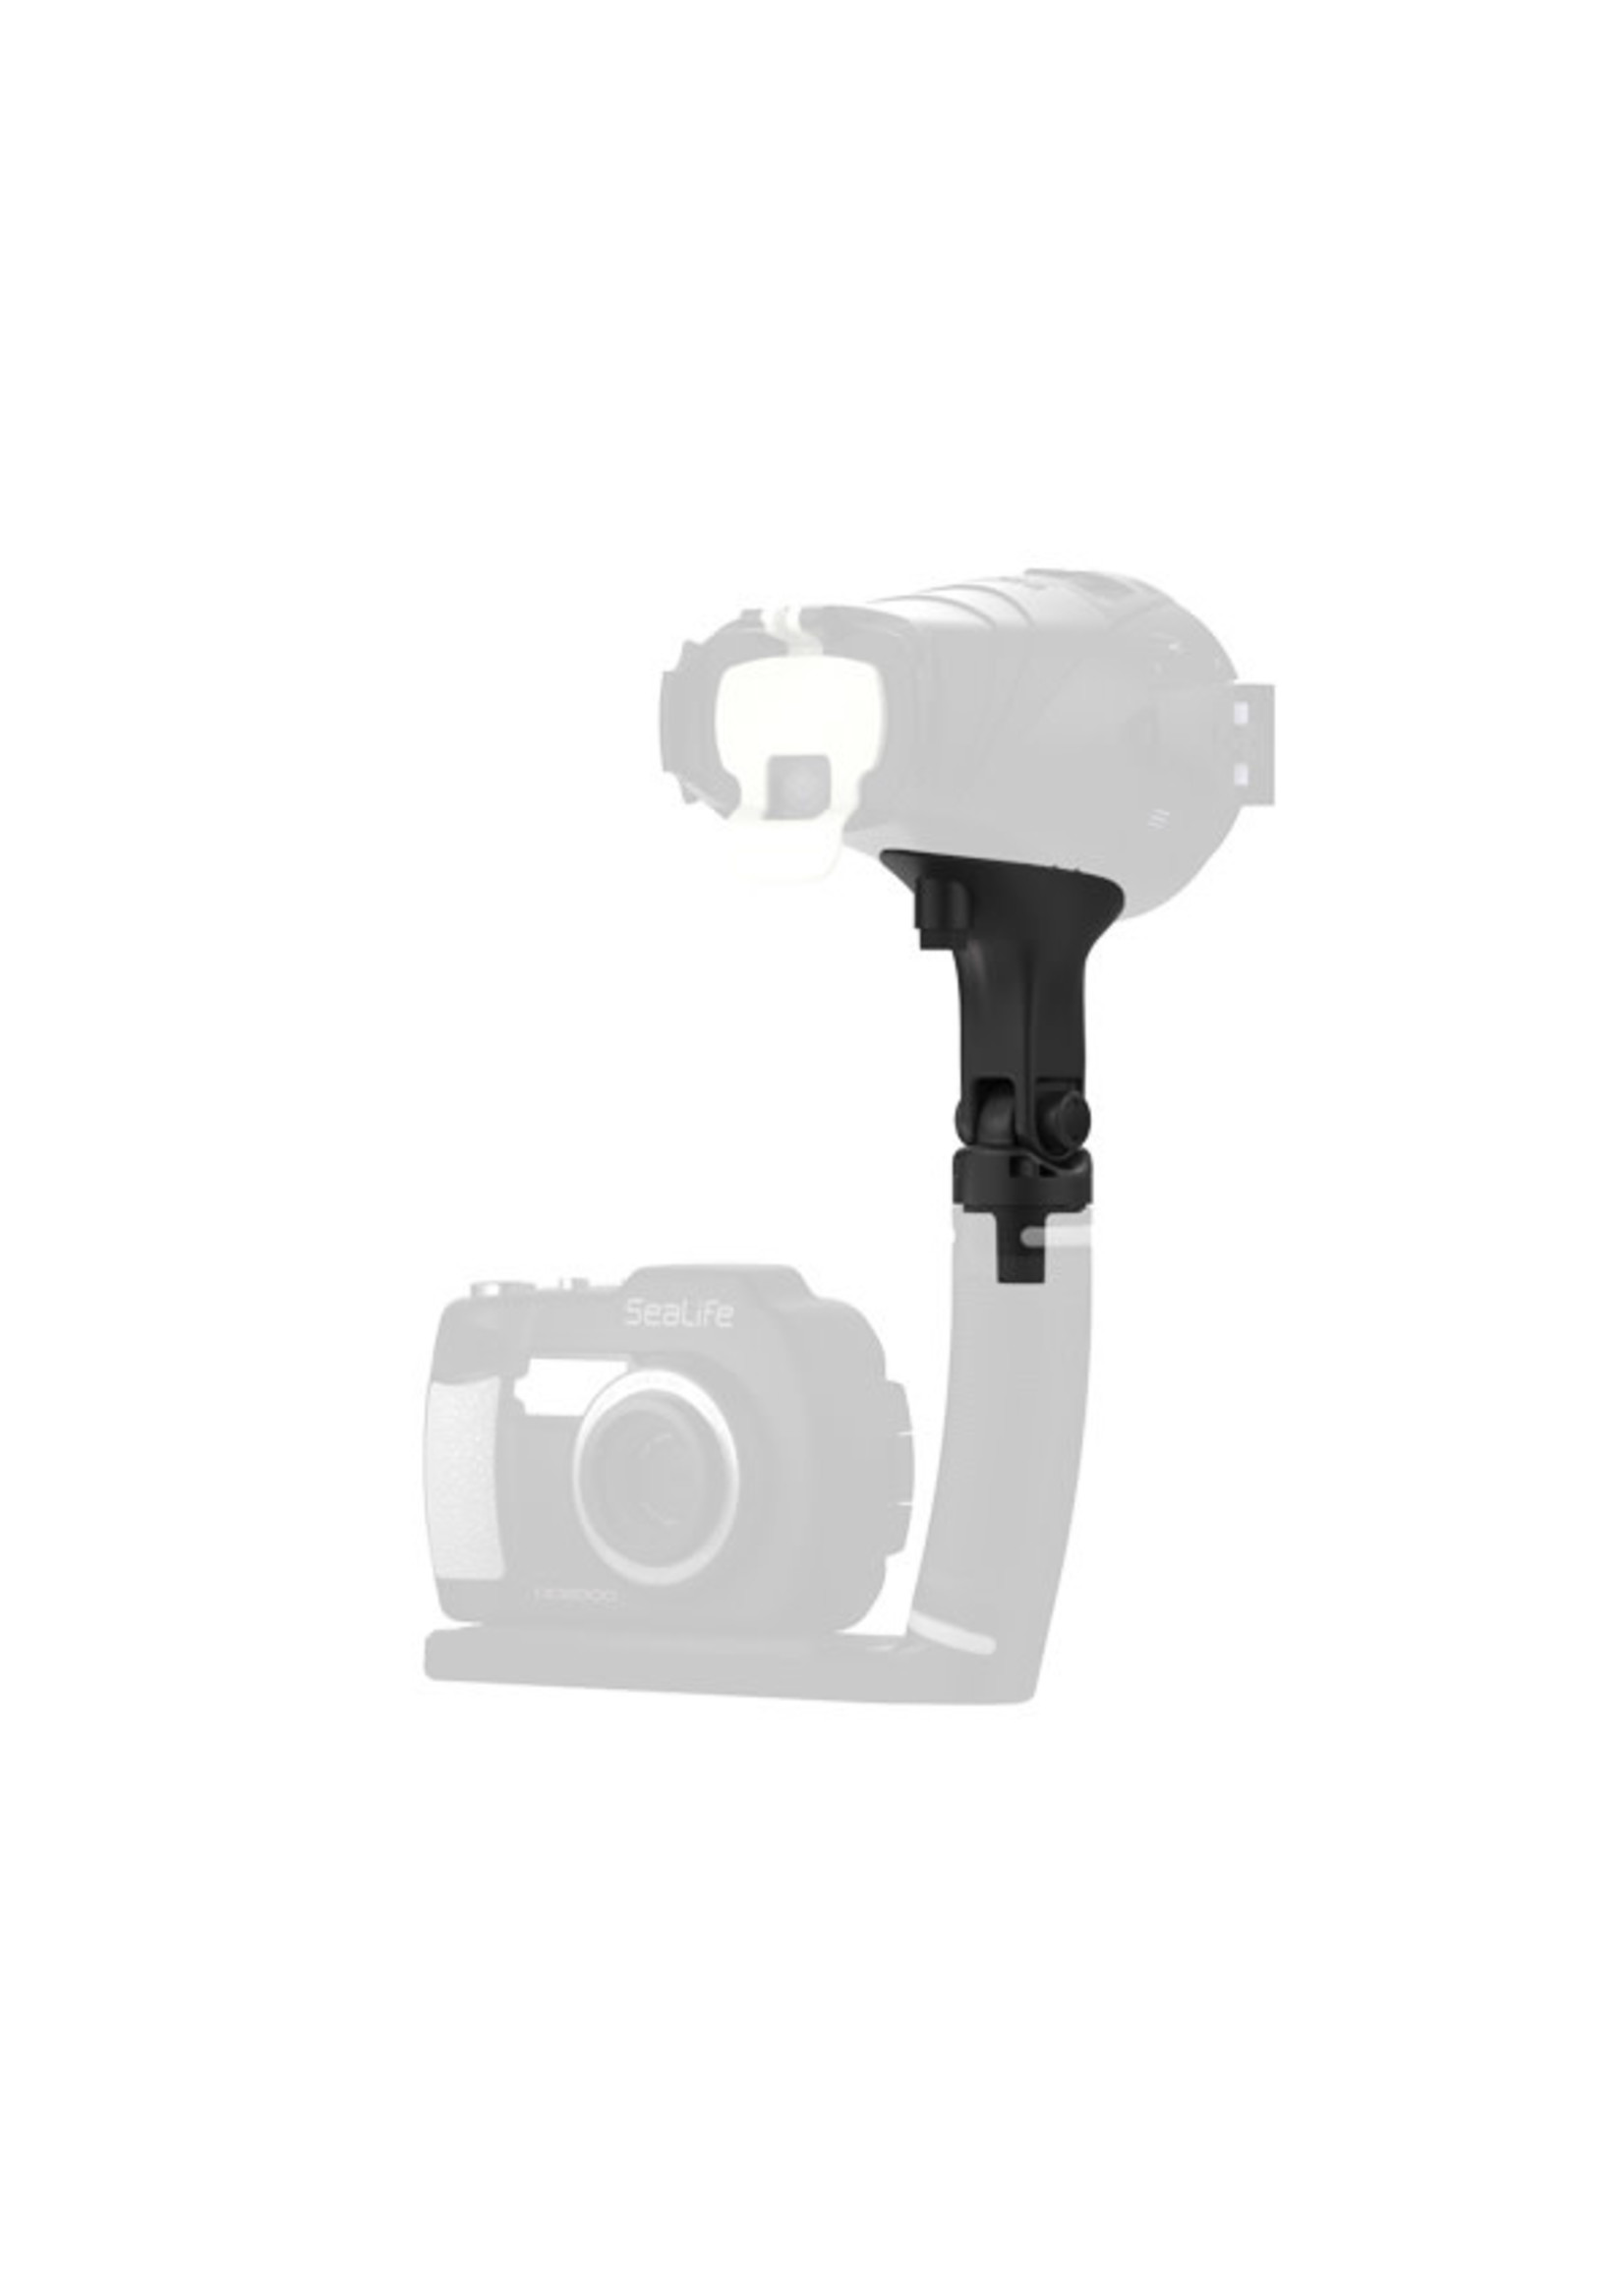 Sealife Flex-Connect Digital Pro Flash Adapter